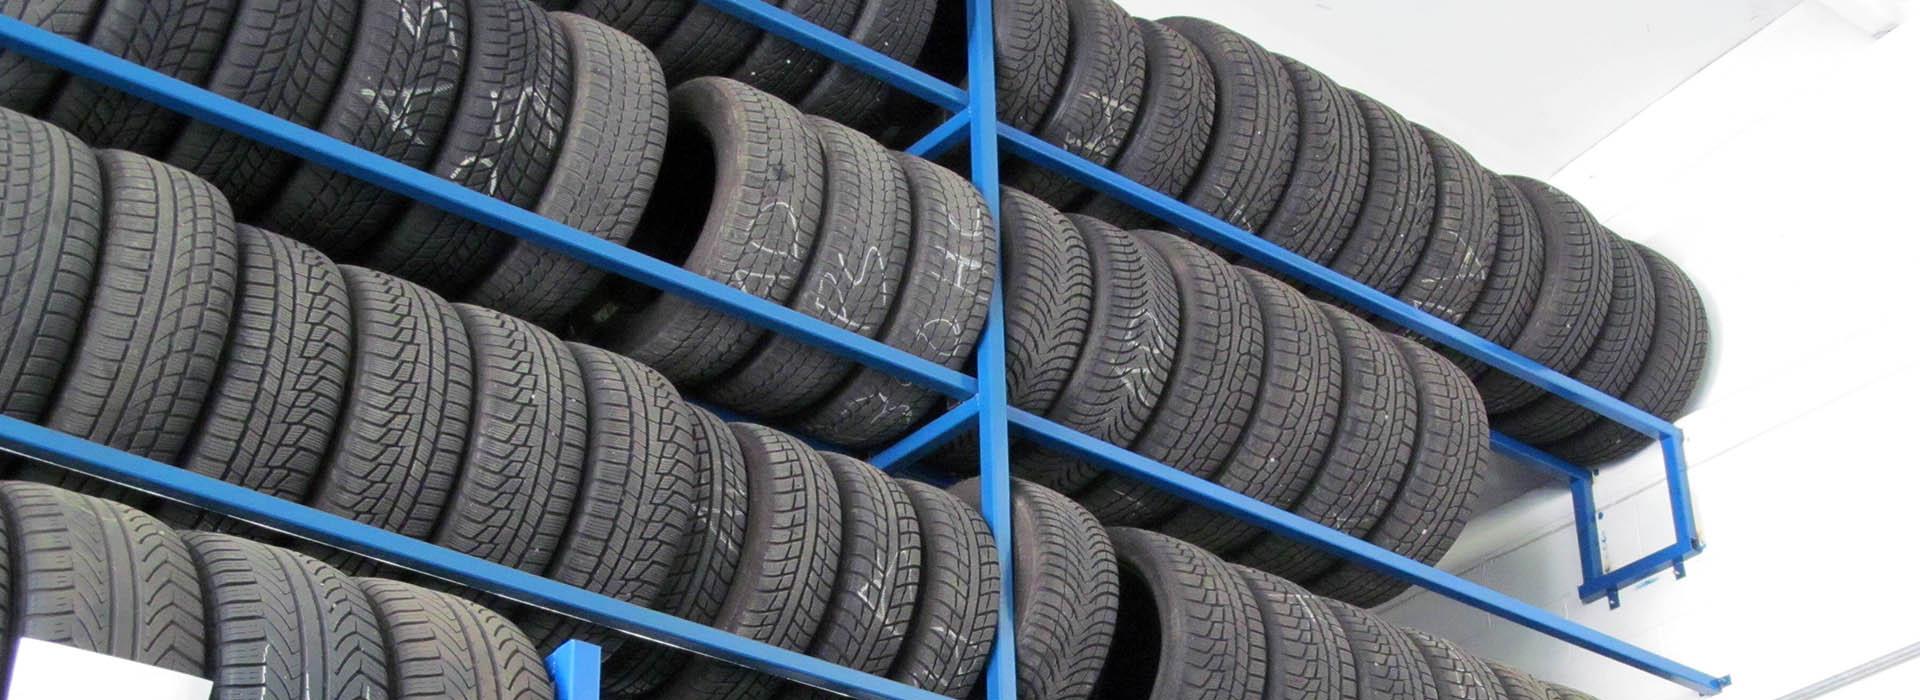 Midas brake prices : Ipod 7th generation case